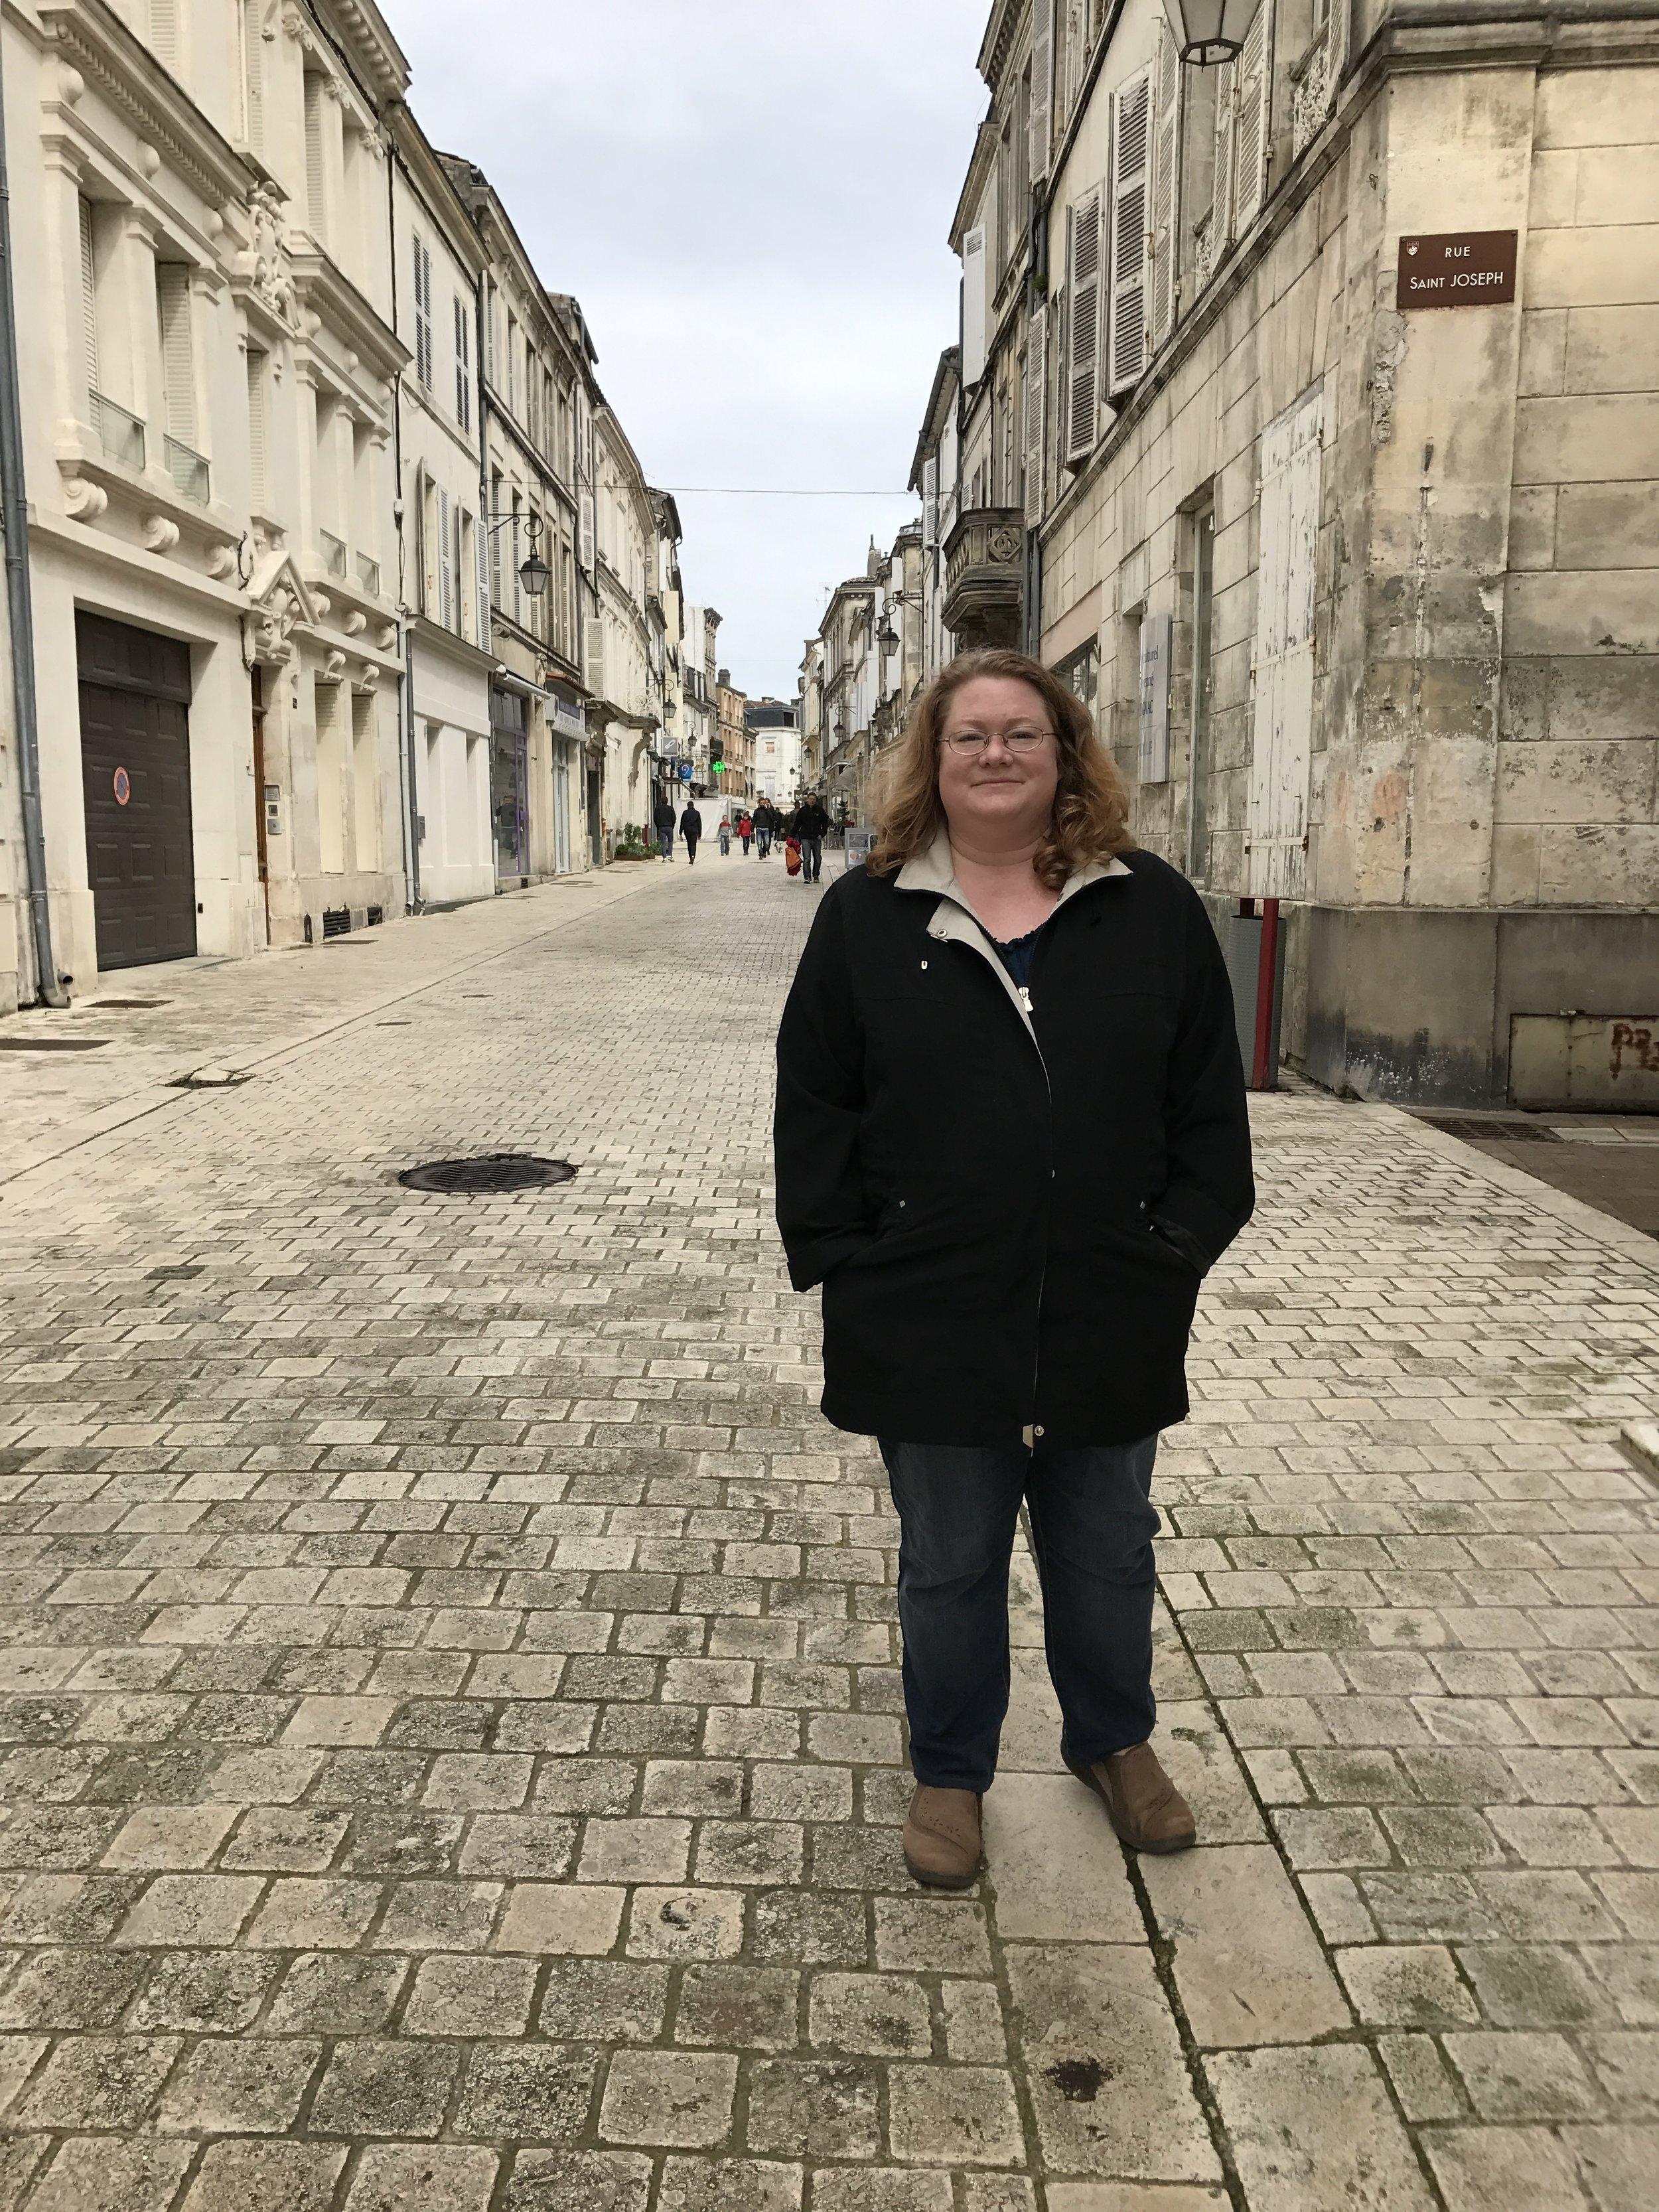 Dianne in Cognac